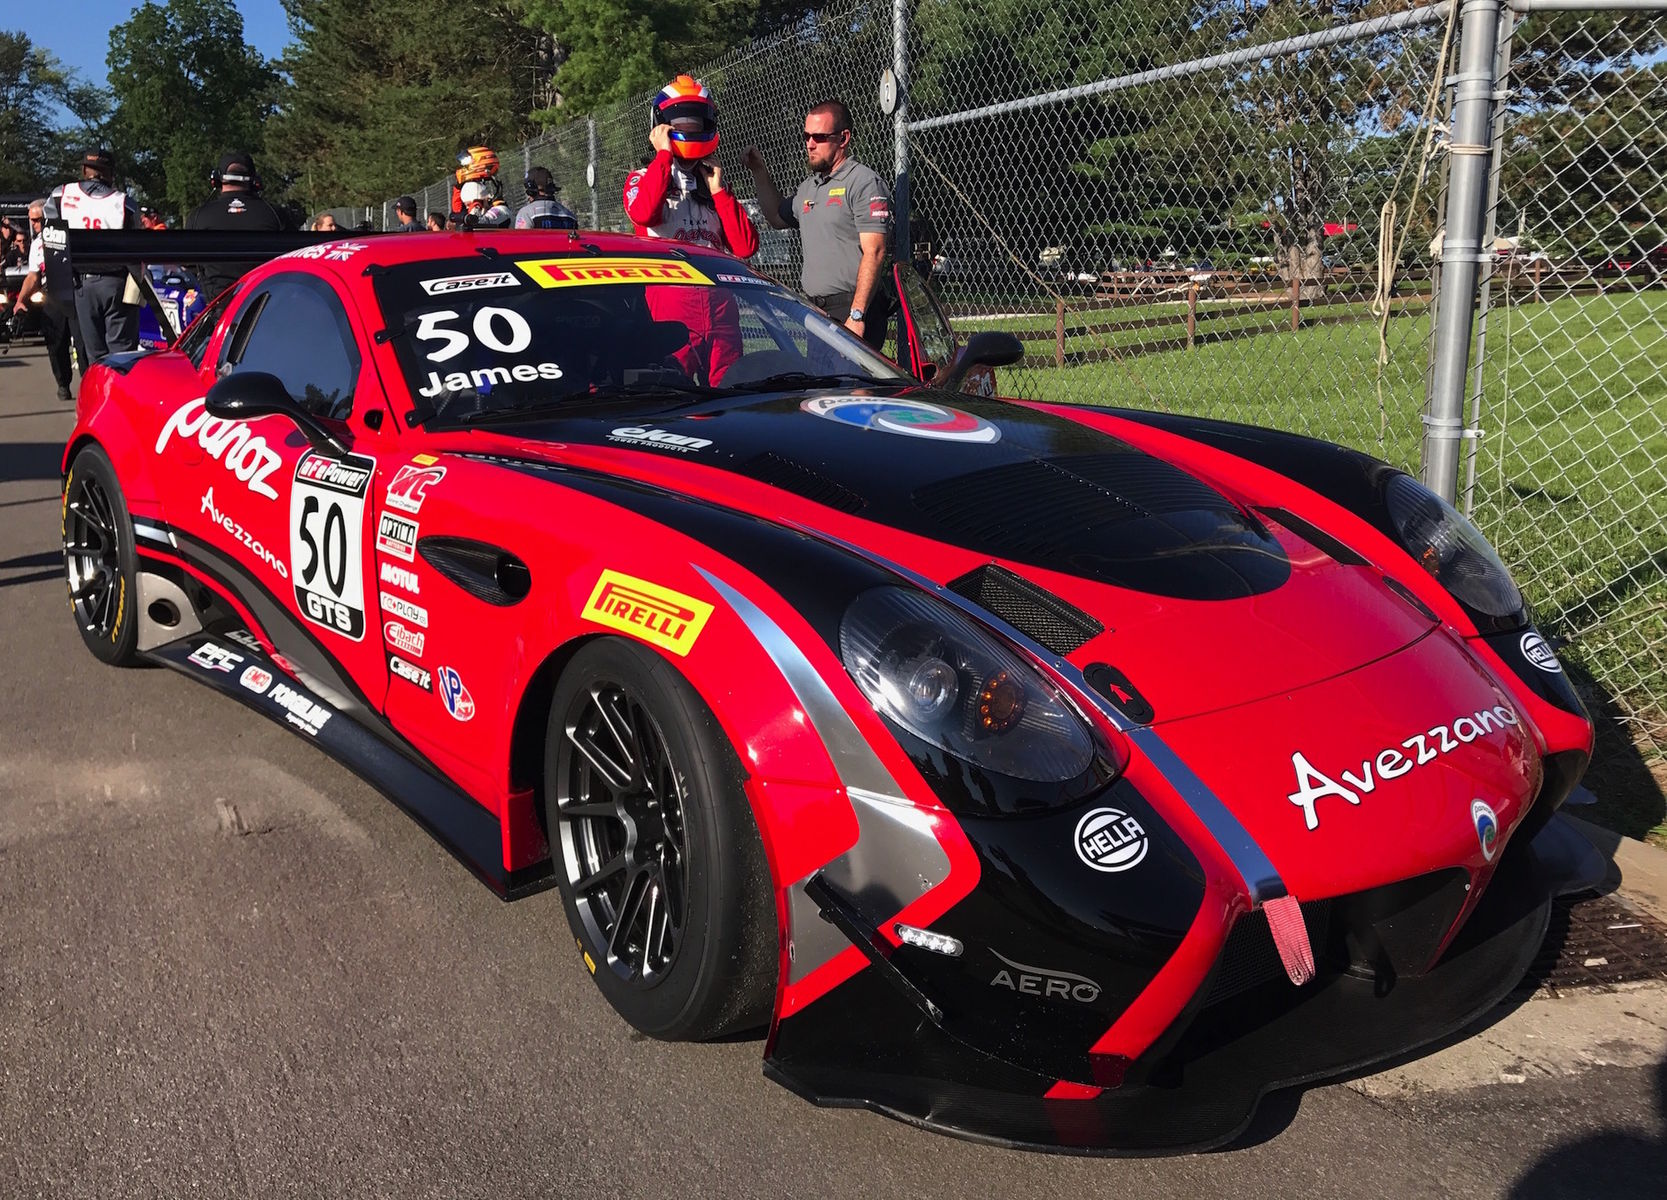 2017 Panoz  | Forgeline Teams Top the Pirelli World Challenge Podium at Mid-Ohio